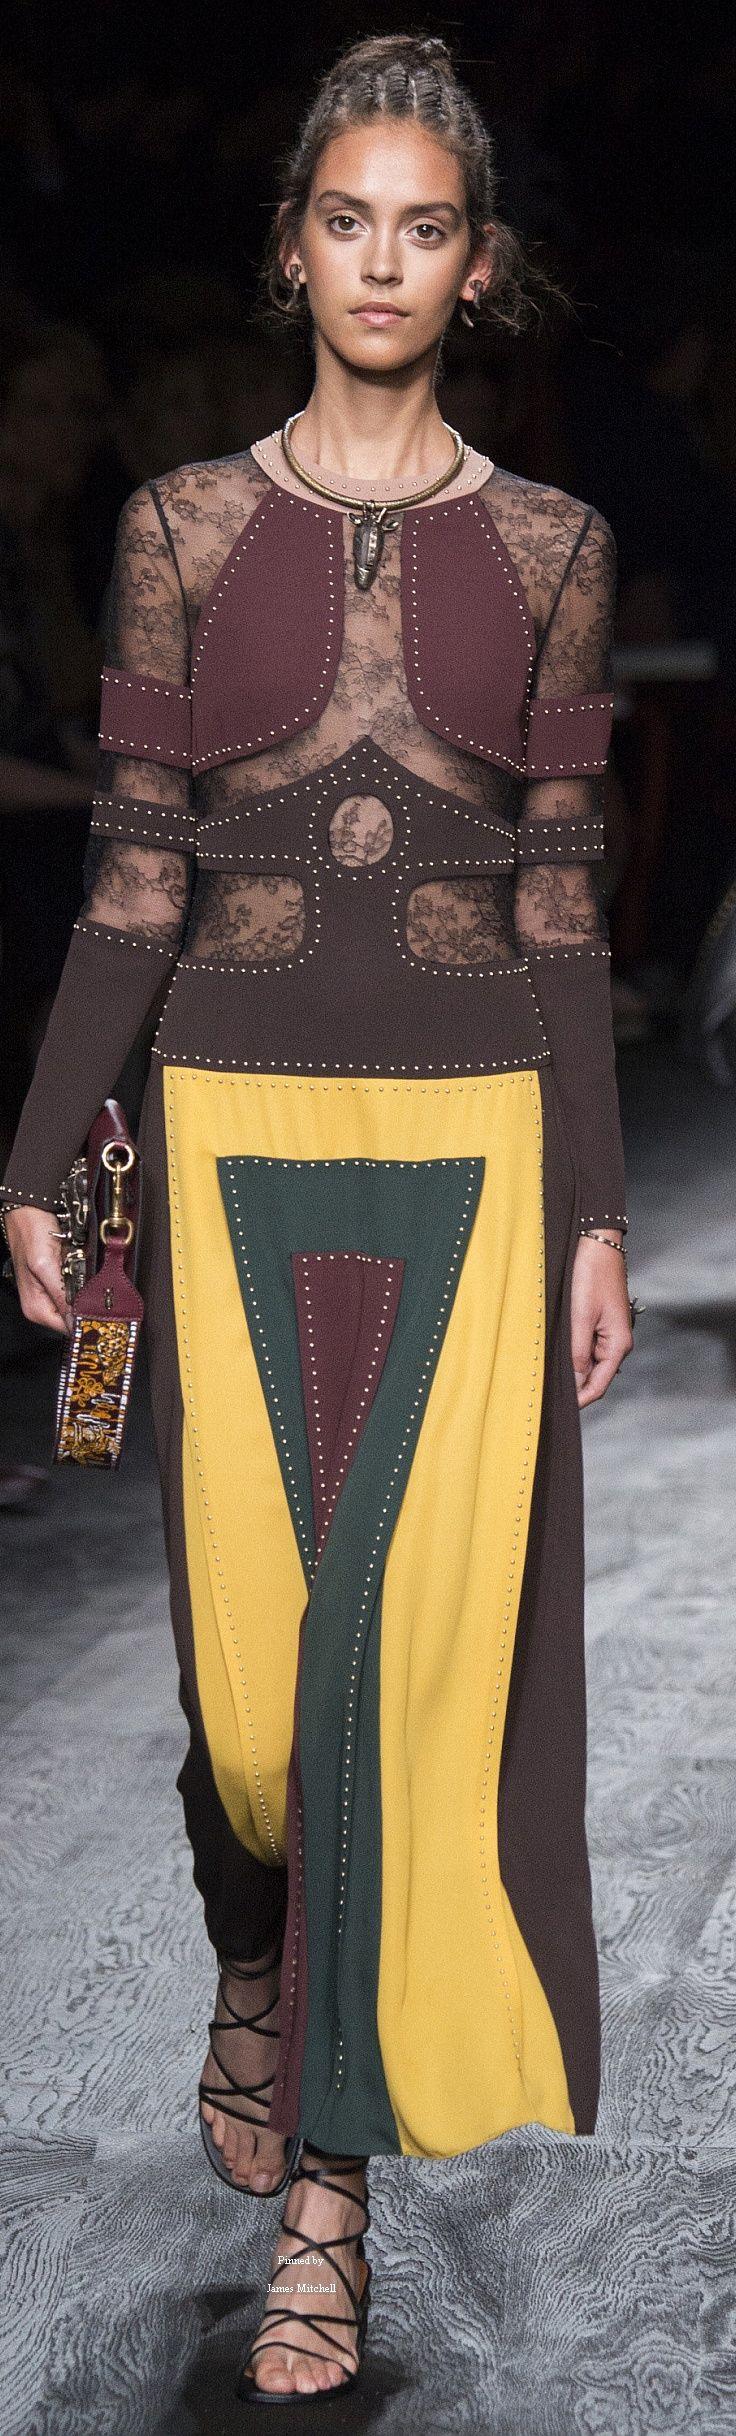 #Farbbberatung #Stilberatung #Farbenreich mit www.farben-reich.com Valentino Collection Spring 2016 Ready-to-Wear